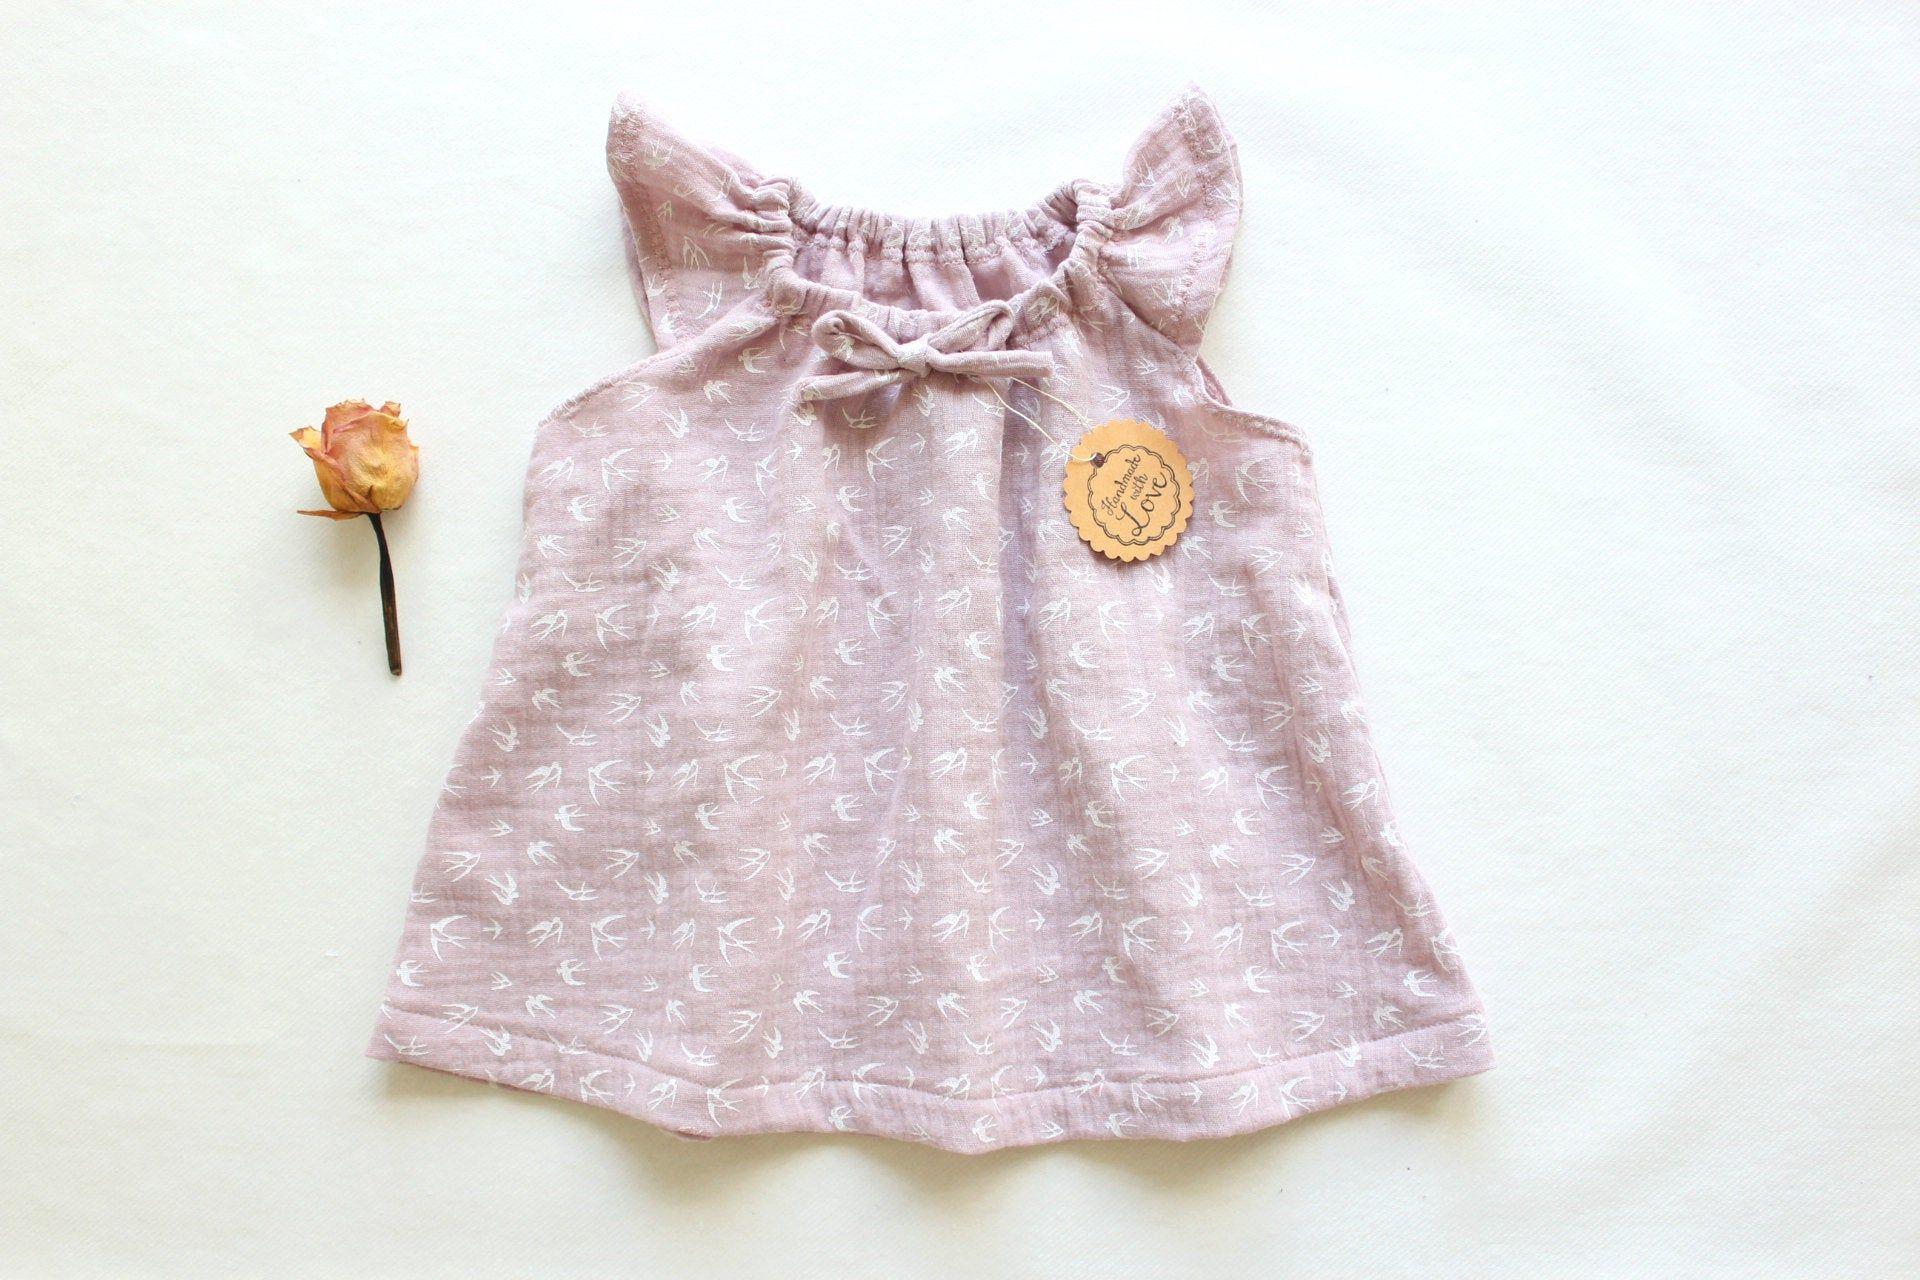 Baby Dress Dusty Rose Crochet Dress Baby Dress Kleid Altrosa Kleidchen Babykleidung